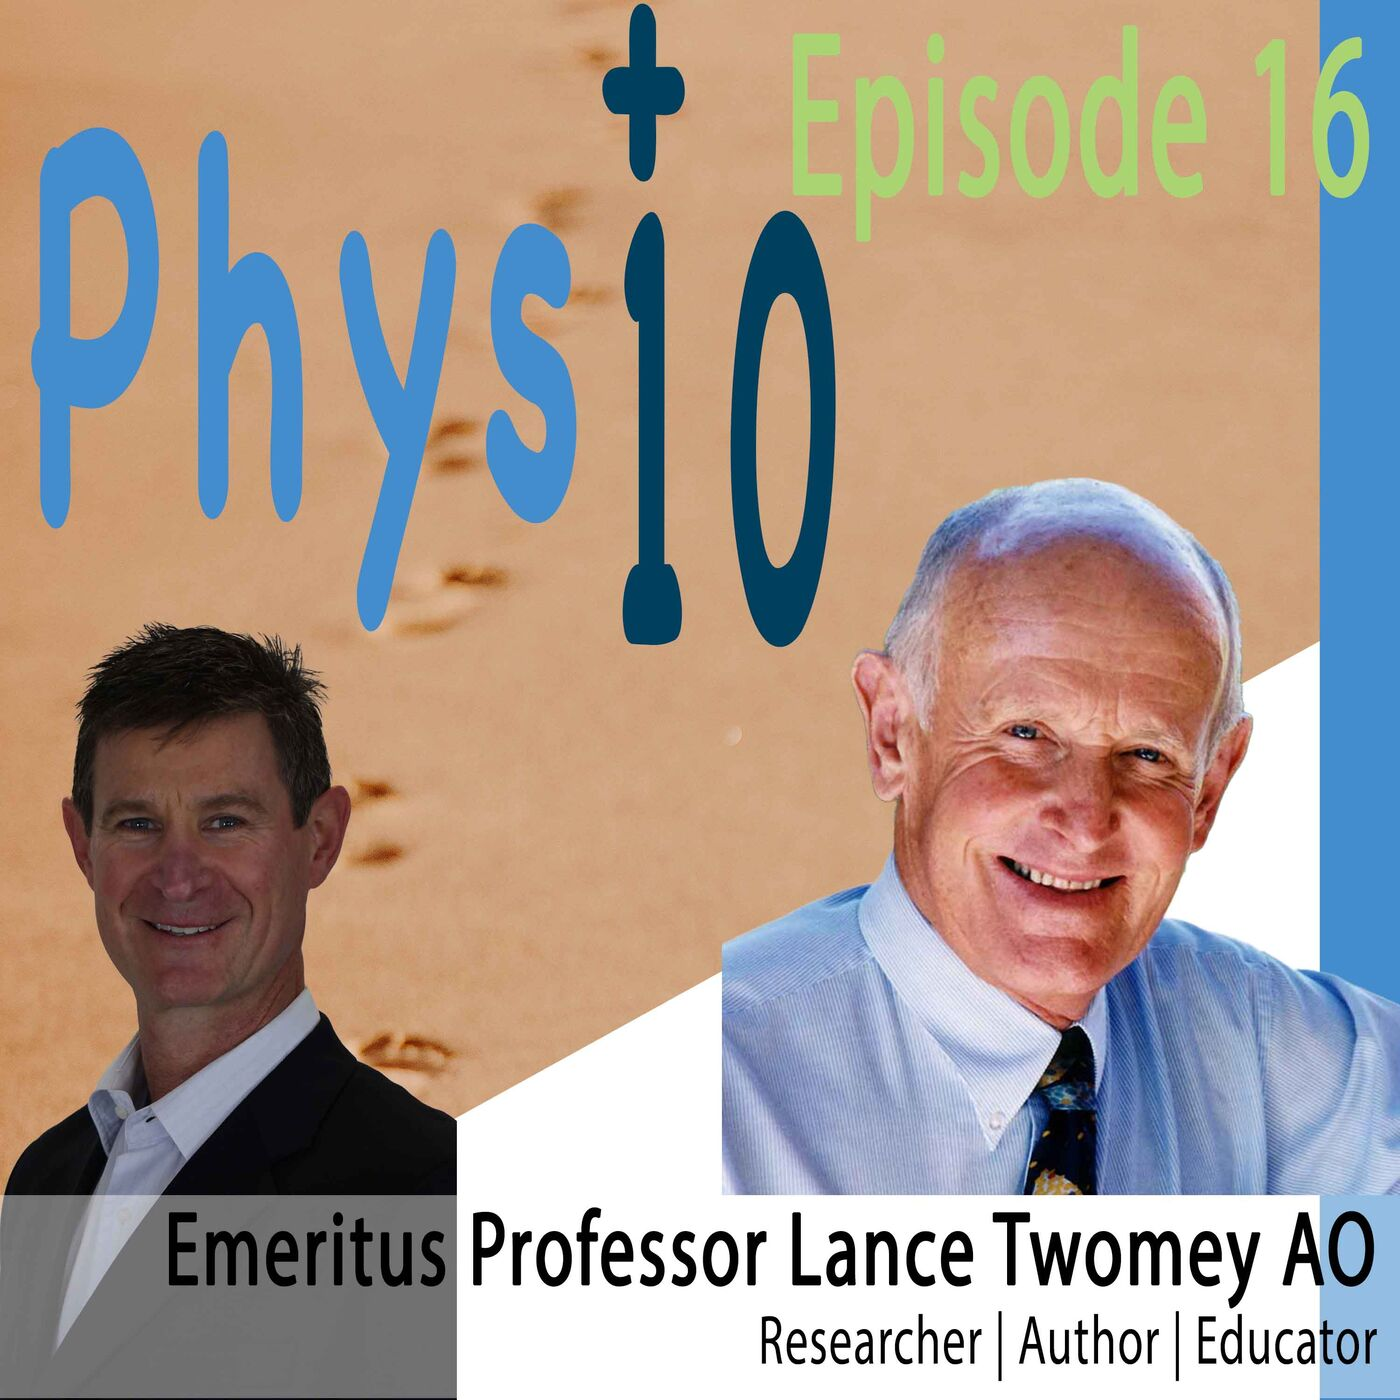 Emeritus Professor Lance Twomey AO Researcher | Educator (Part 2)